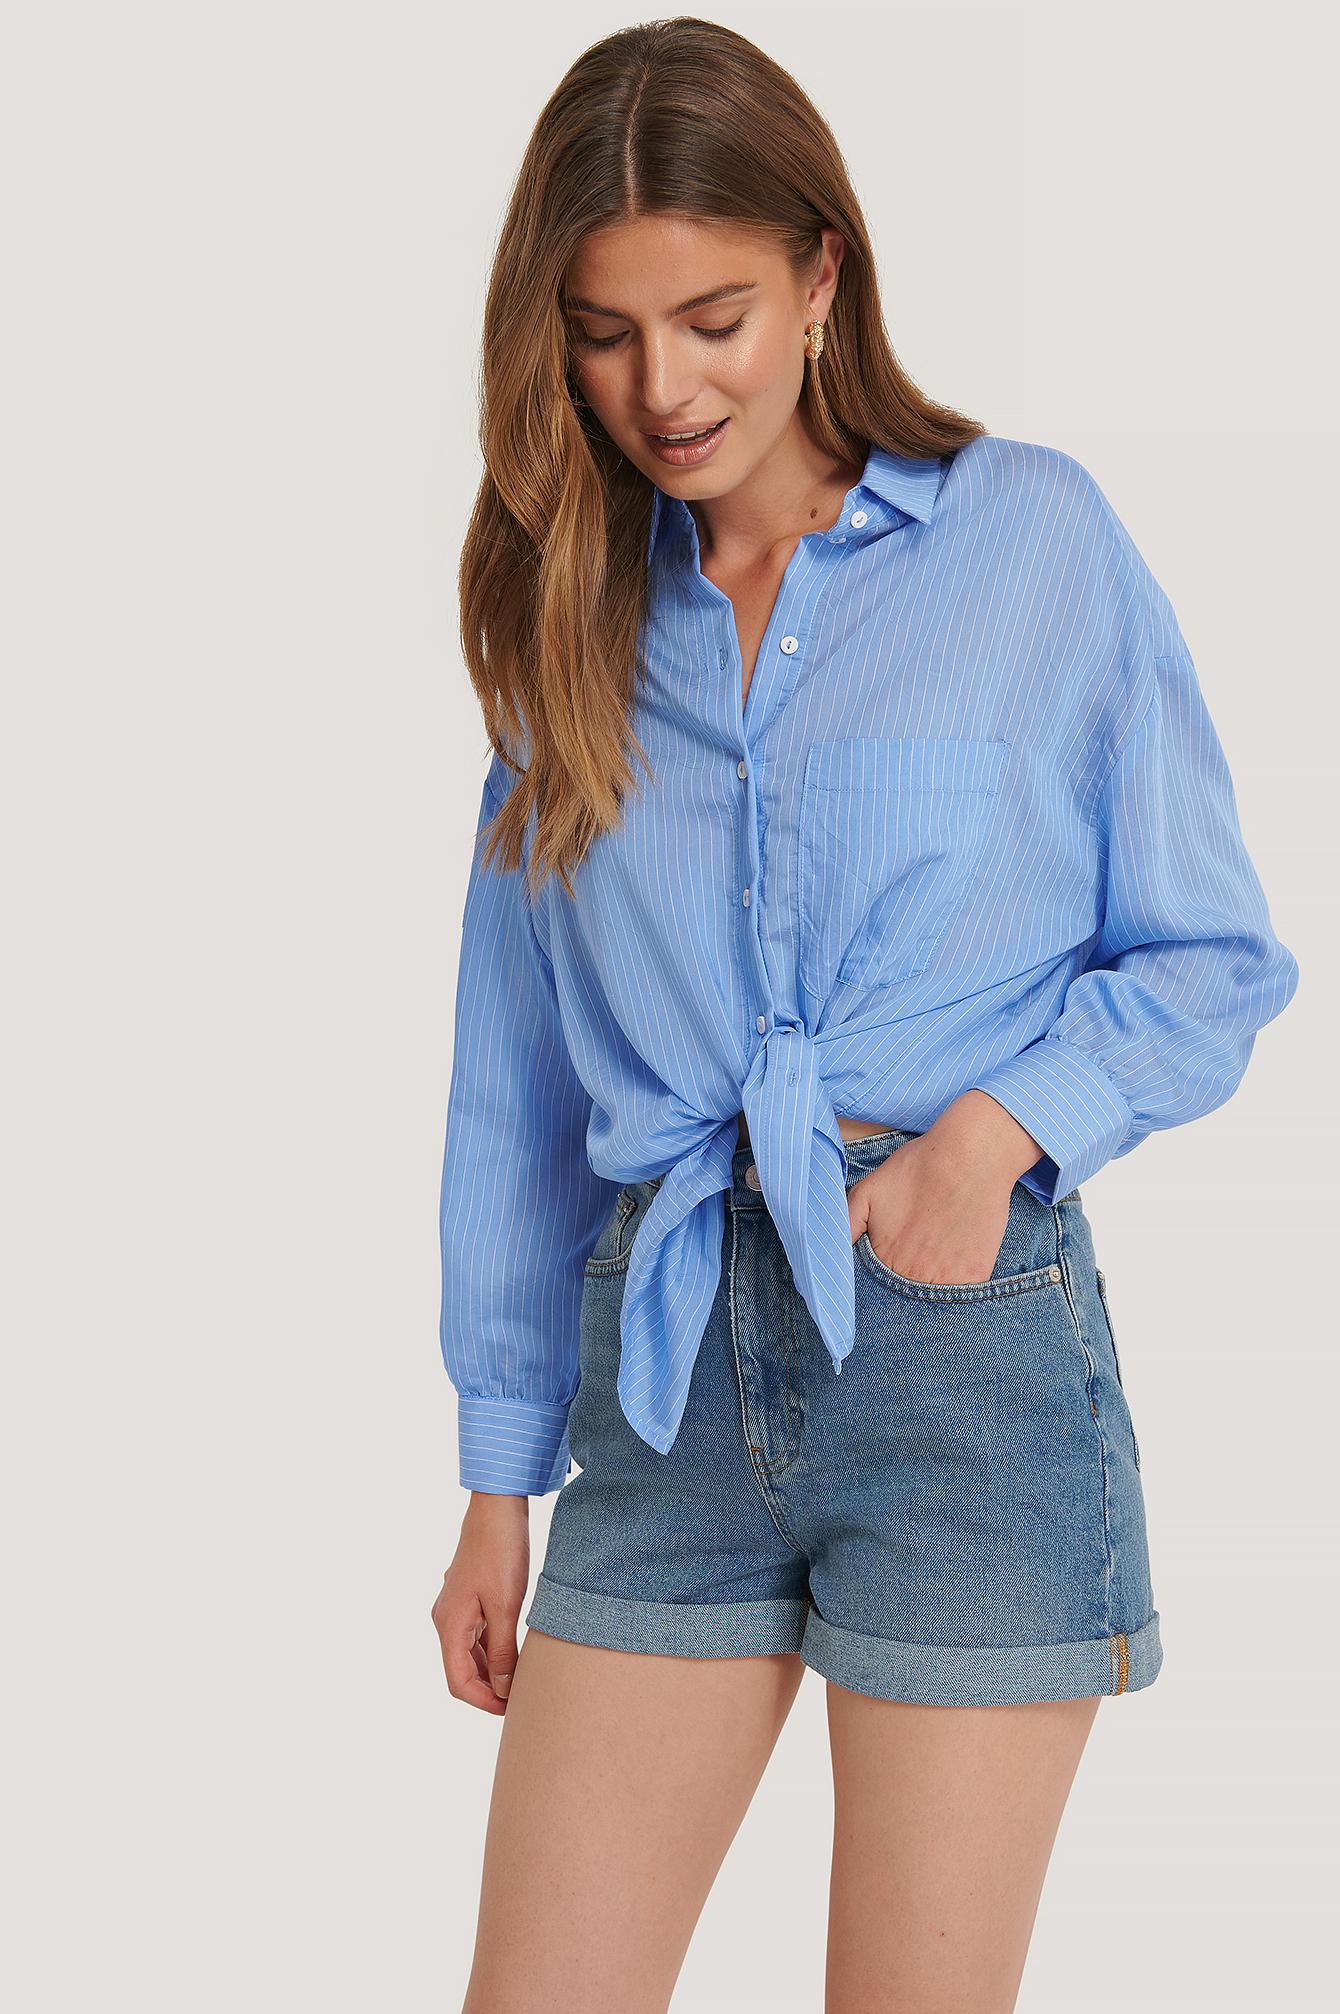 na-kd -  Jeans-Shorts Mit Gefaltetem Saum - Blue